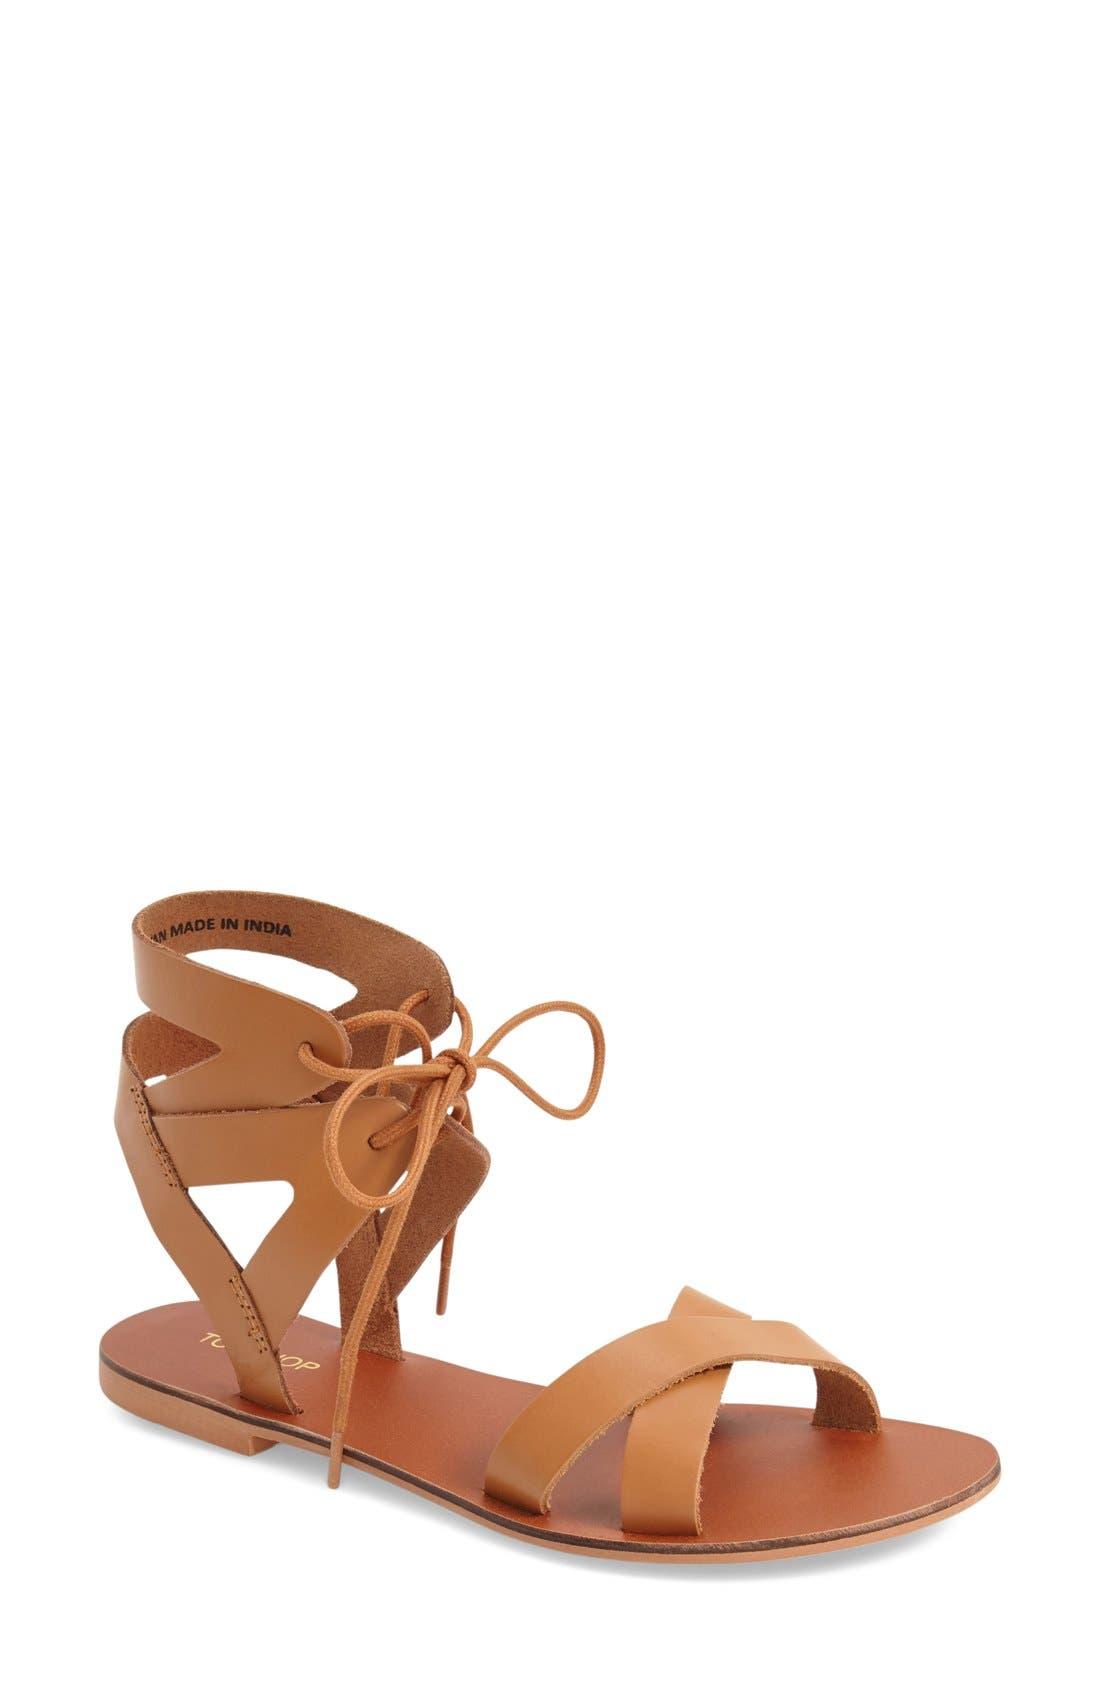 TOPSHOP, 'Herb' Lace-Up Flat Sandal, Main thumbnail 1, color, 210